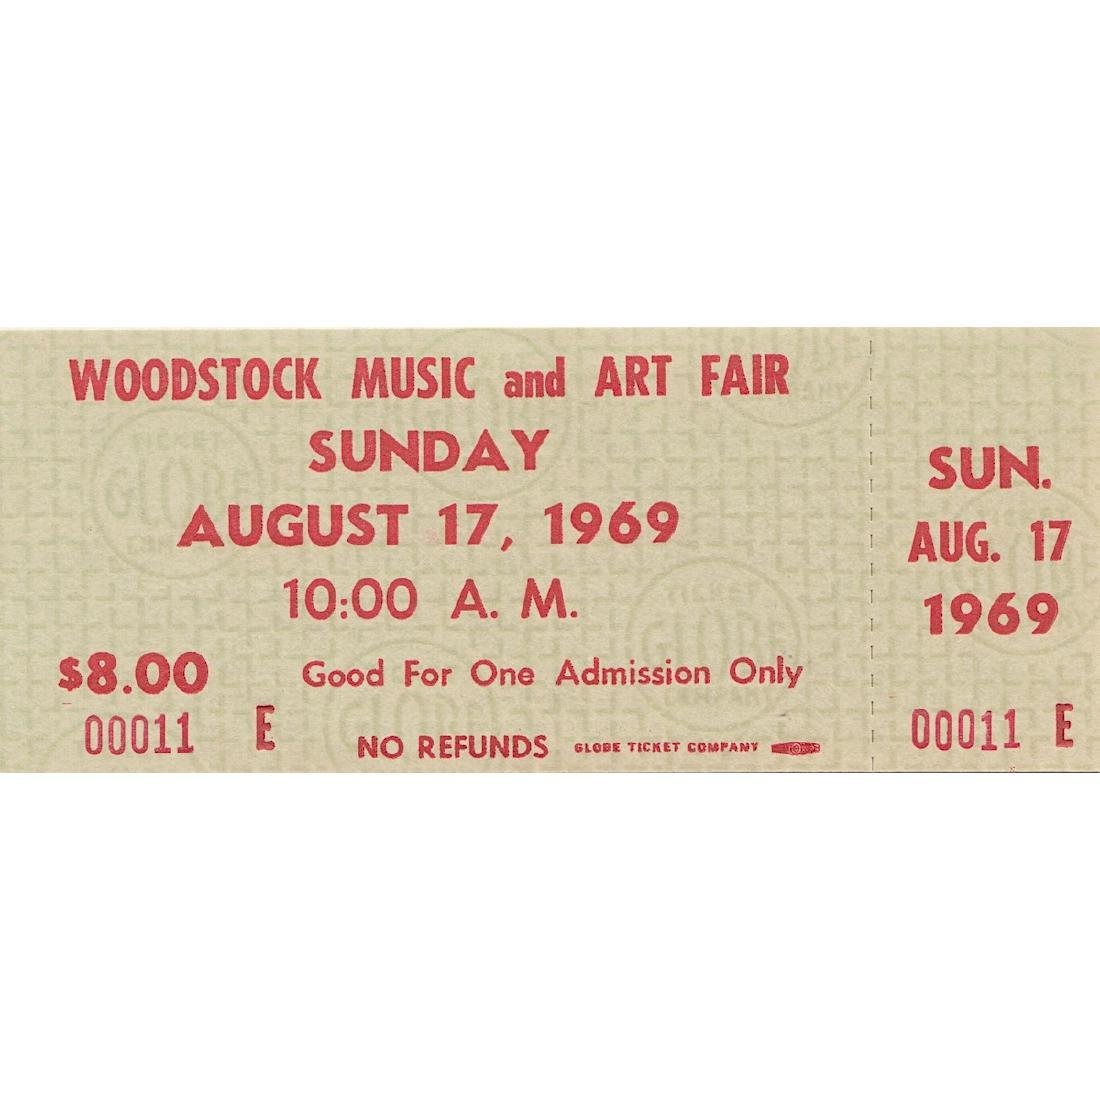 Woodstock - 1969 Ticket Numbered #00011